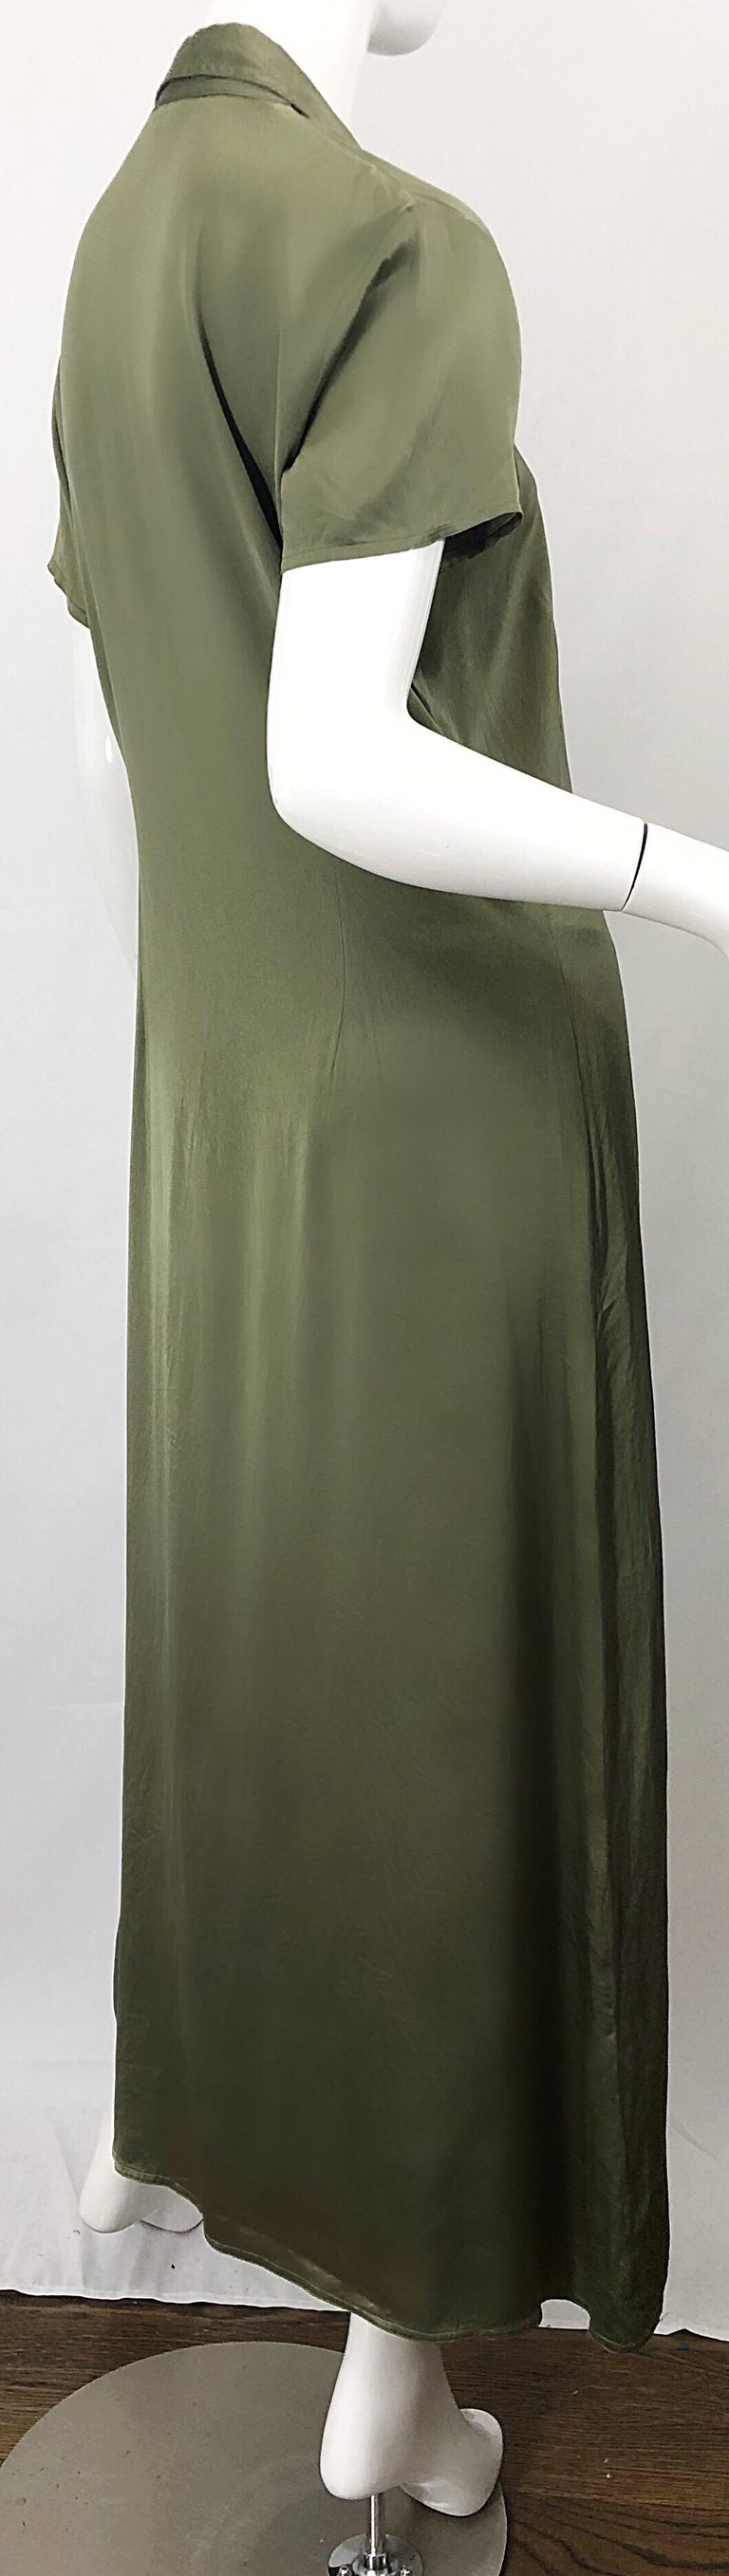 1970s Halston Olive Green Liquid Silk Vintage 70s Short Sleeve Maxi Shirt Dress For Sale 6